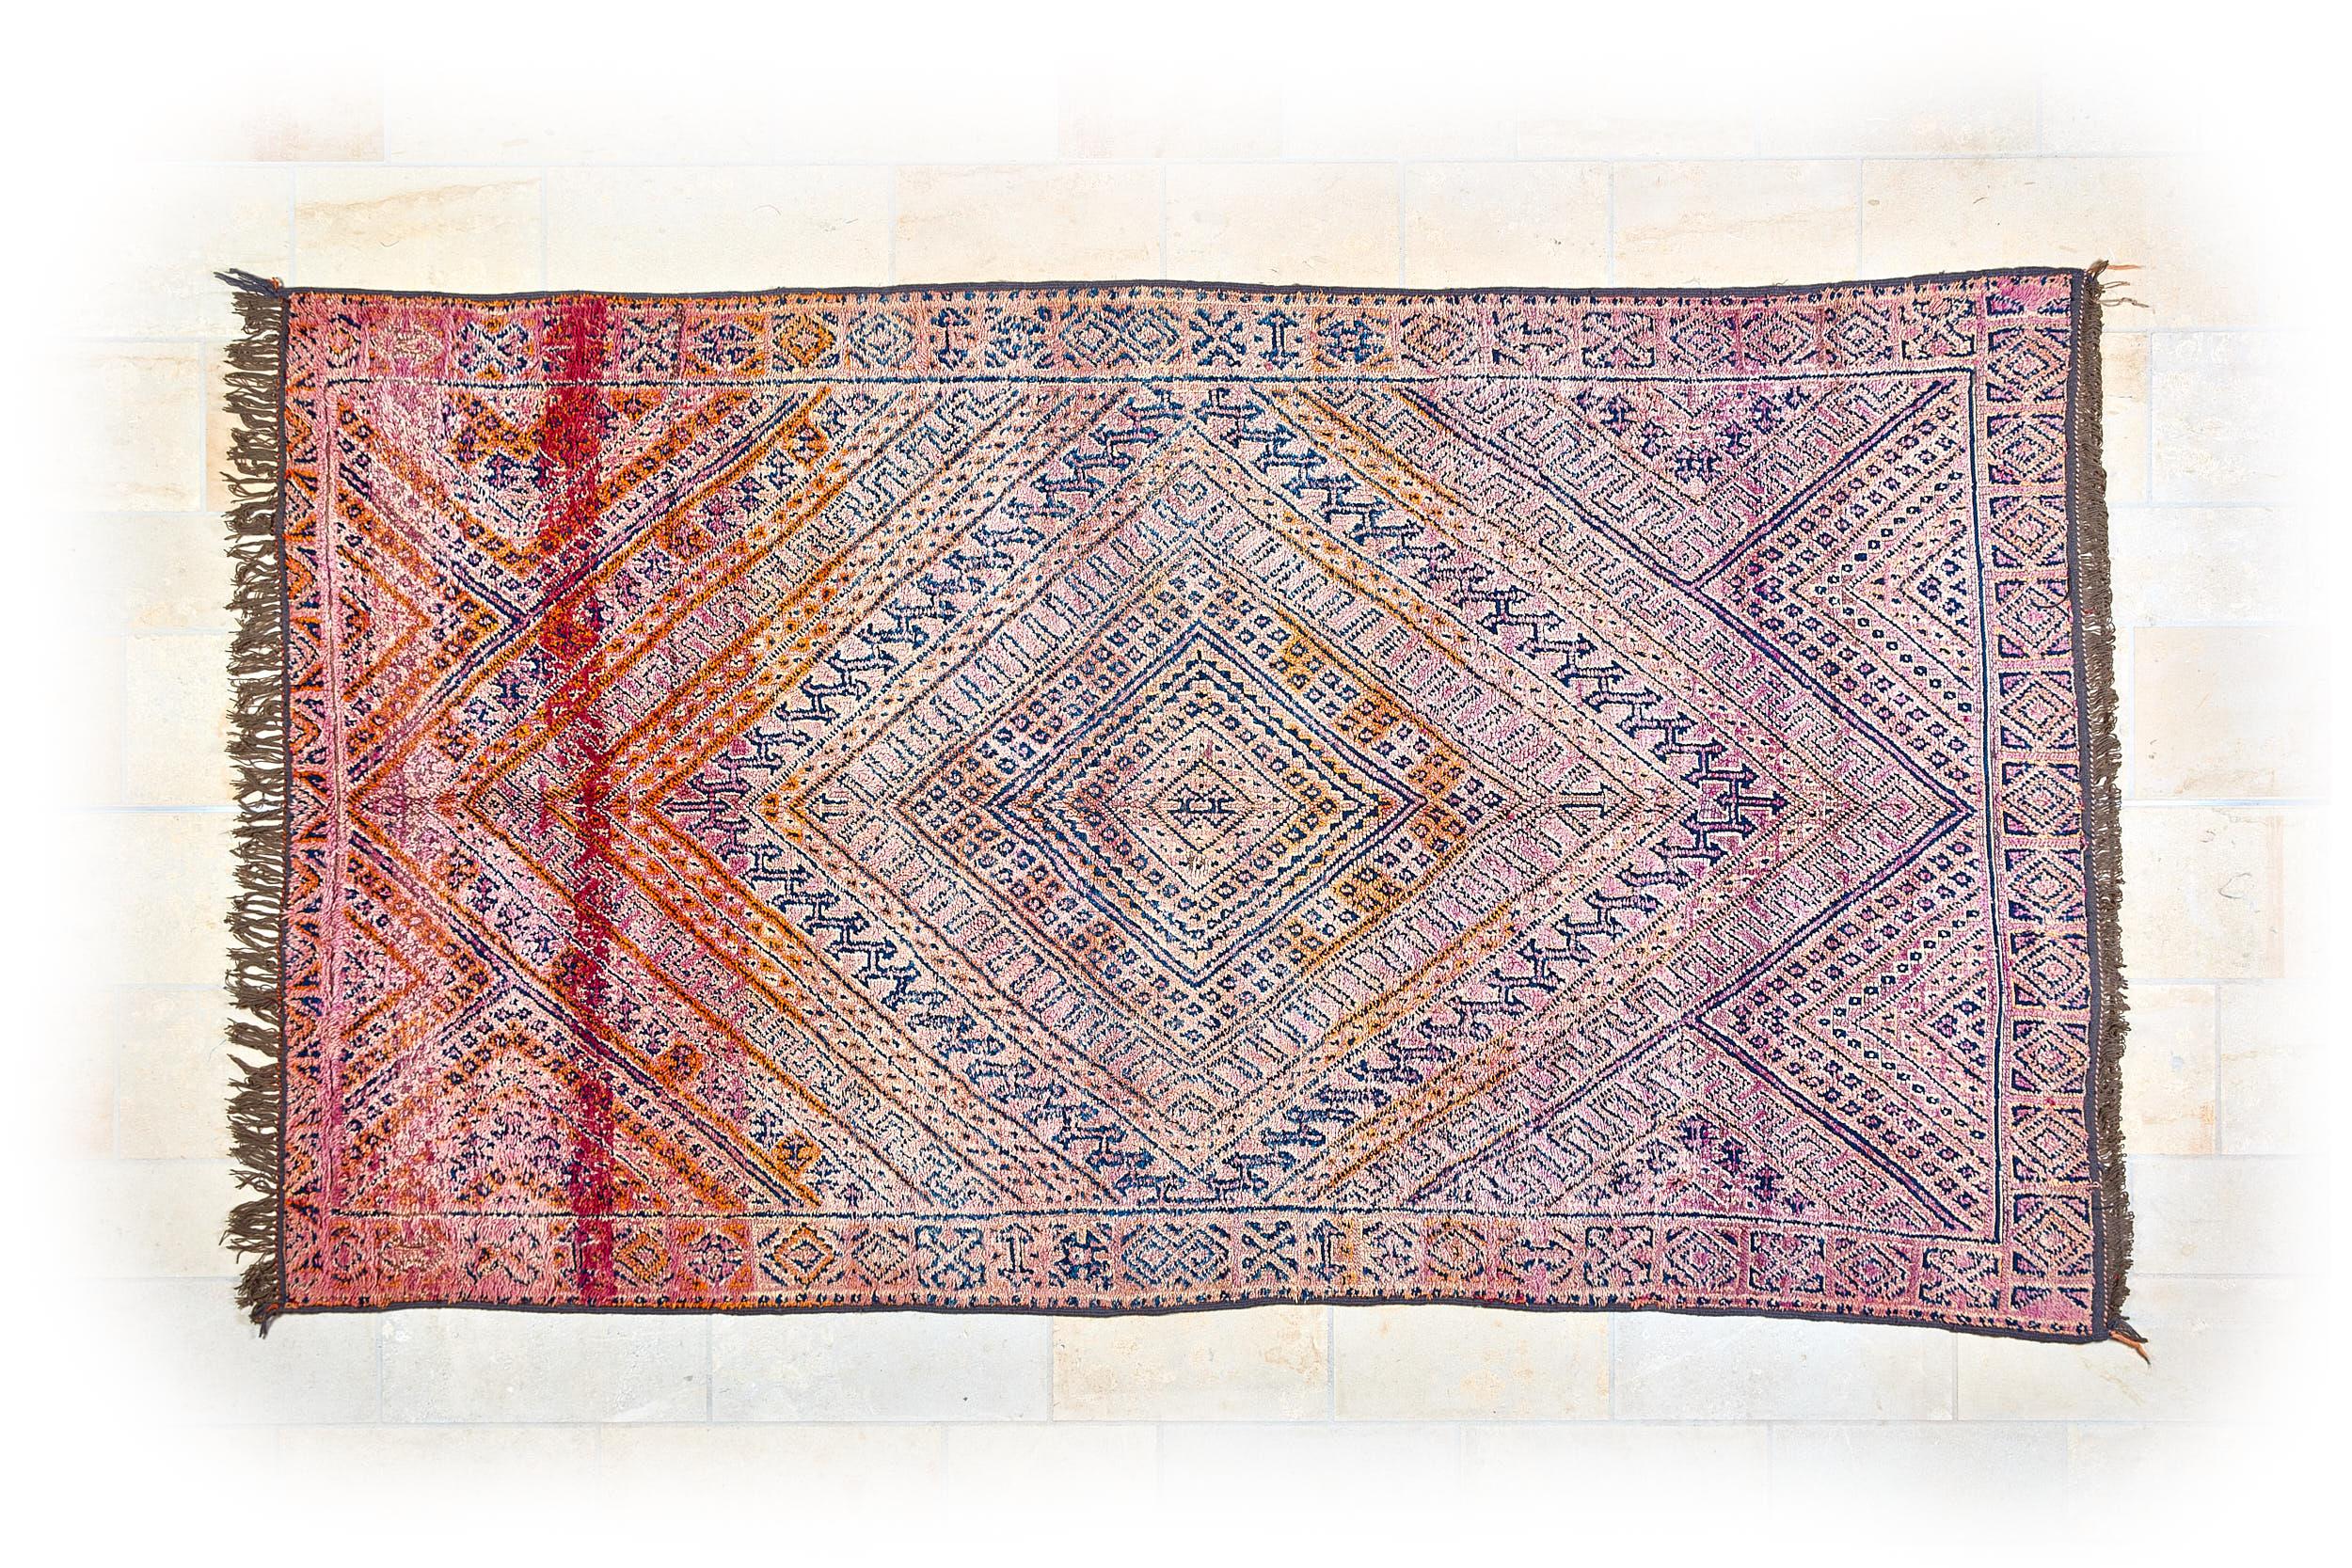 Marokkanischer Berberteppich - Beni Mguild - VERKAUFT